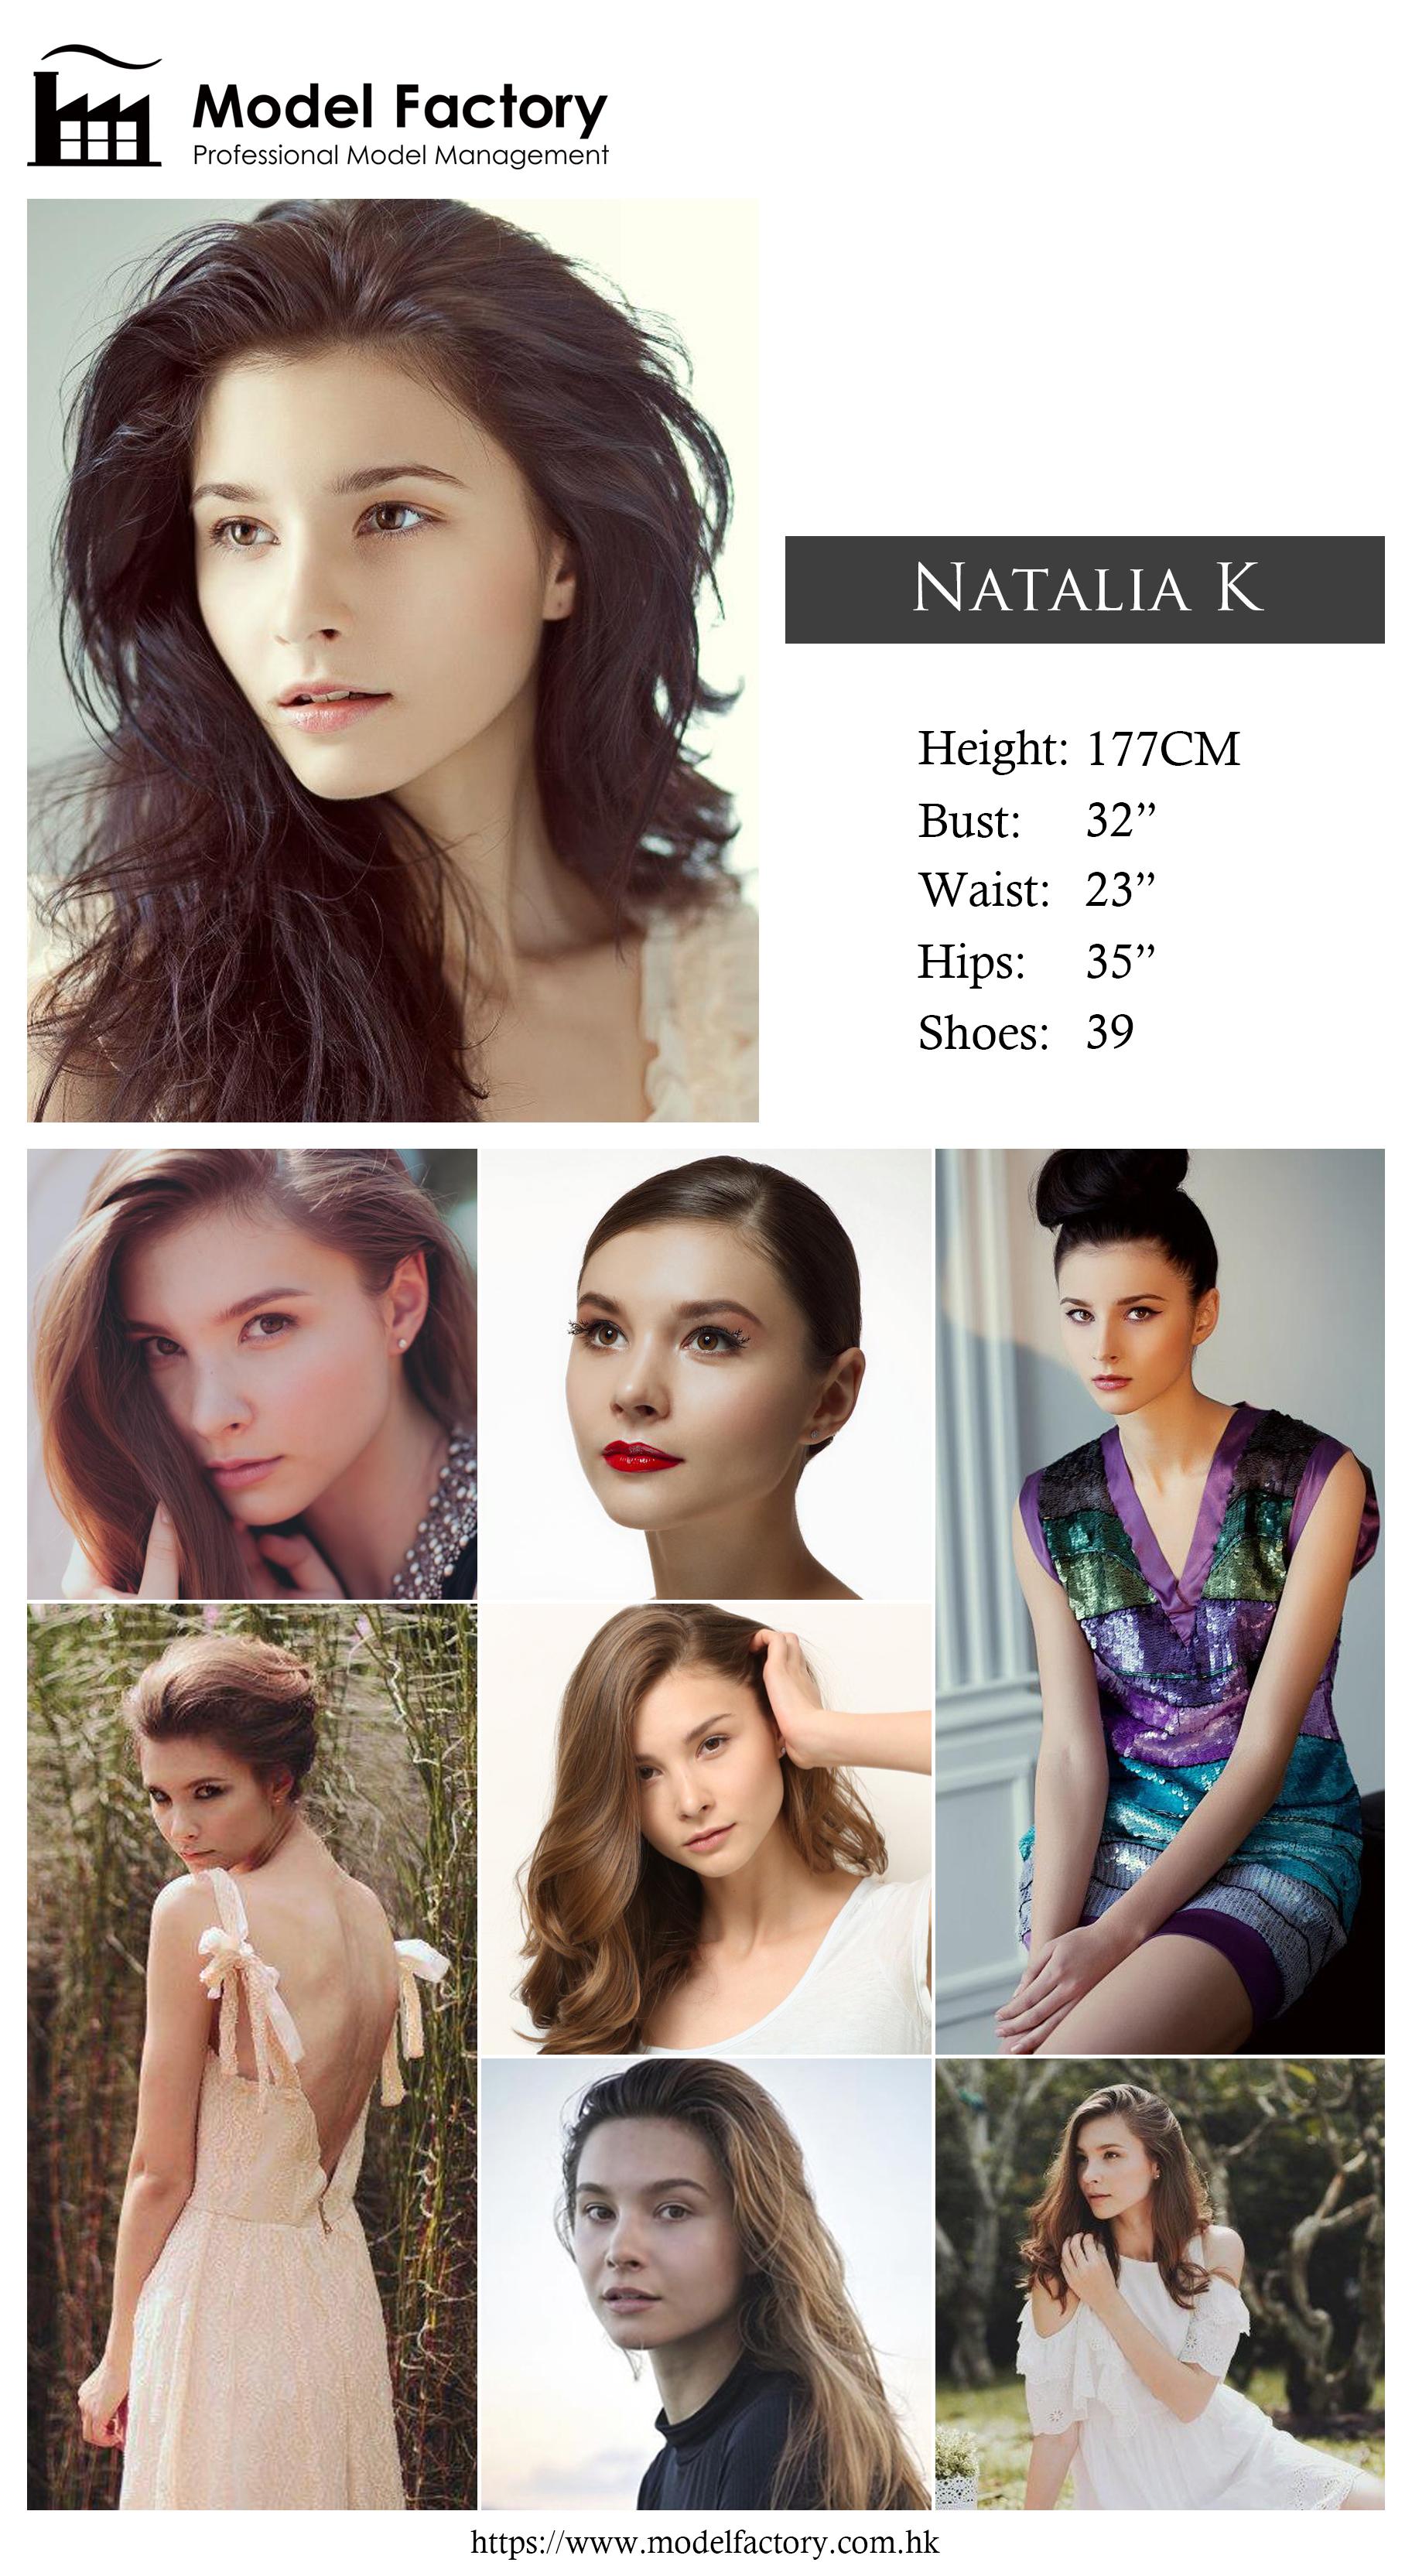 Model Factory Caucasian Female Model NataliaK